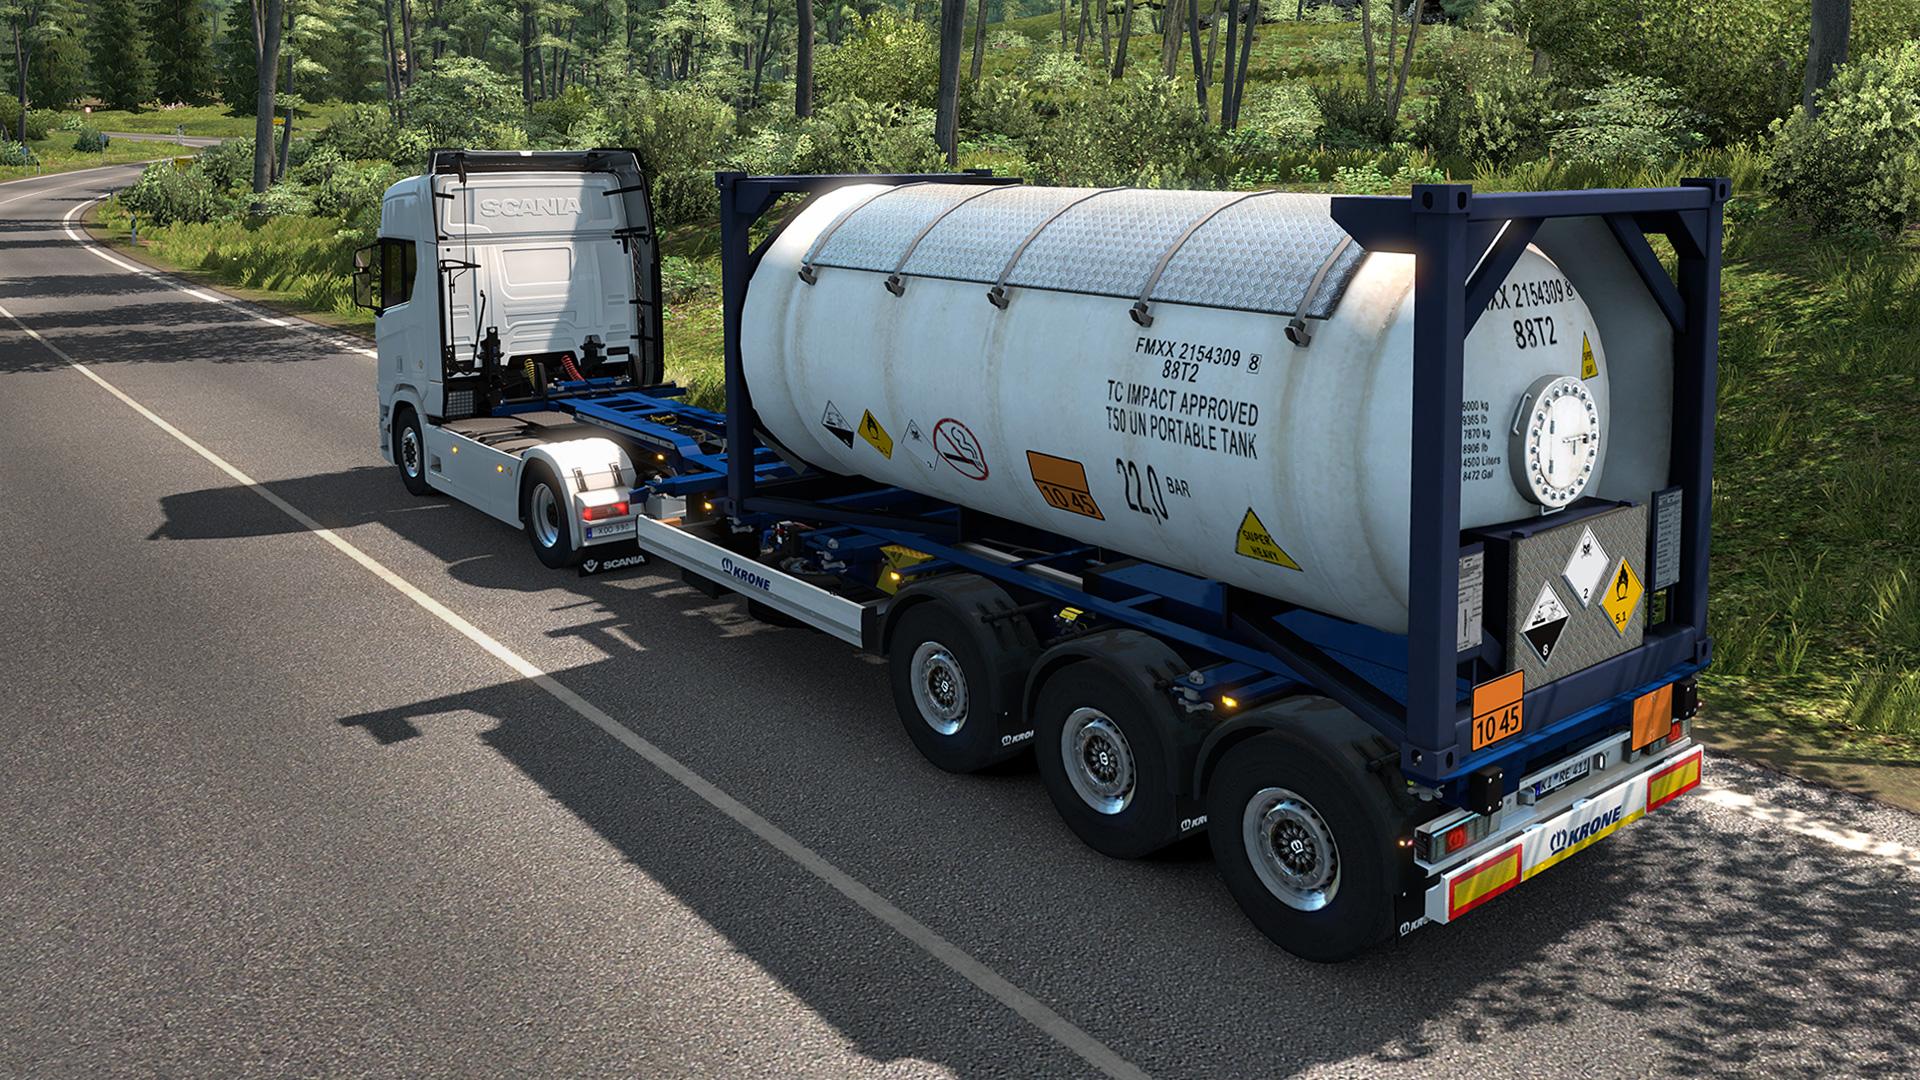 Save 50 On Euro Truck Simulator 2 Krone Trailer Pack On Steam